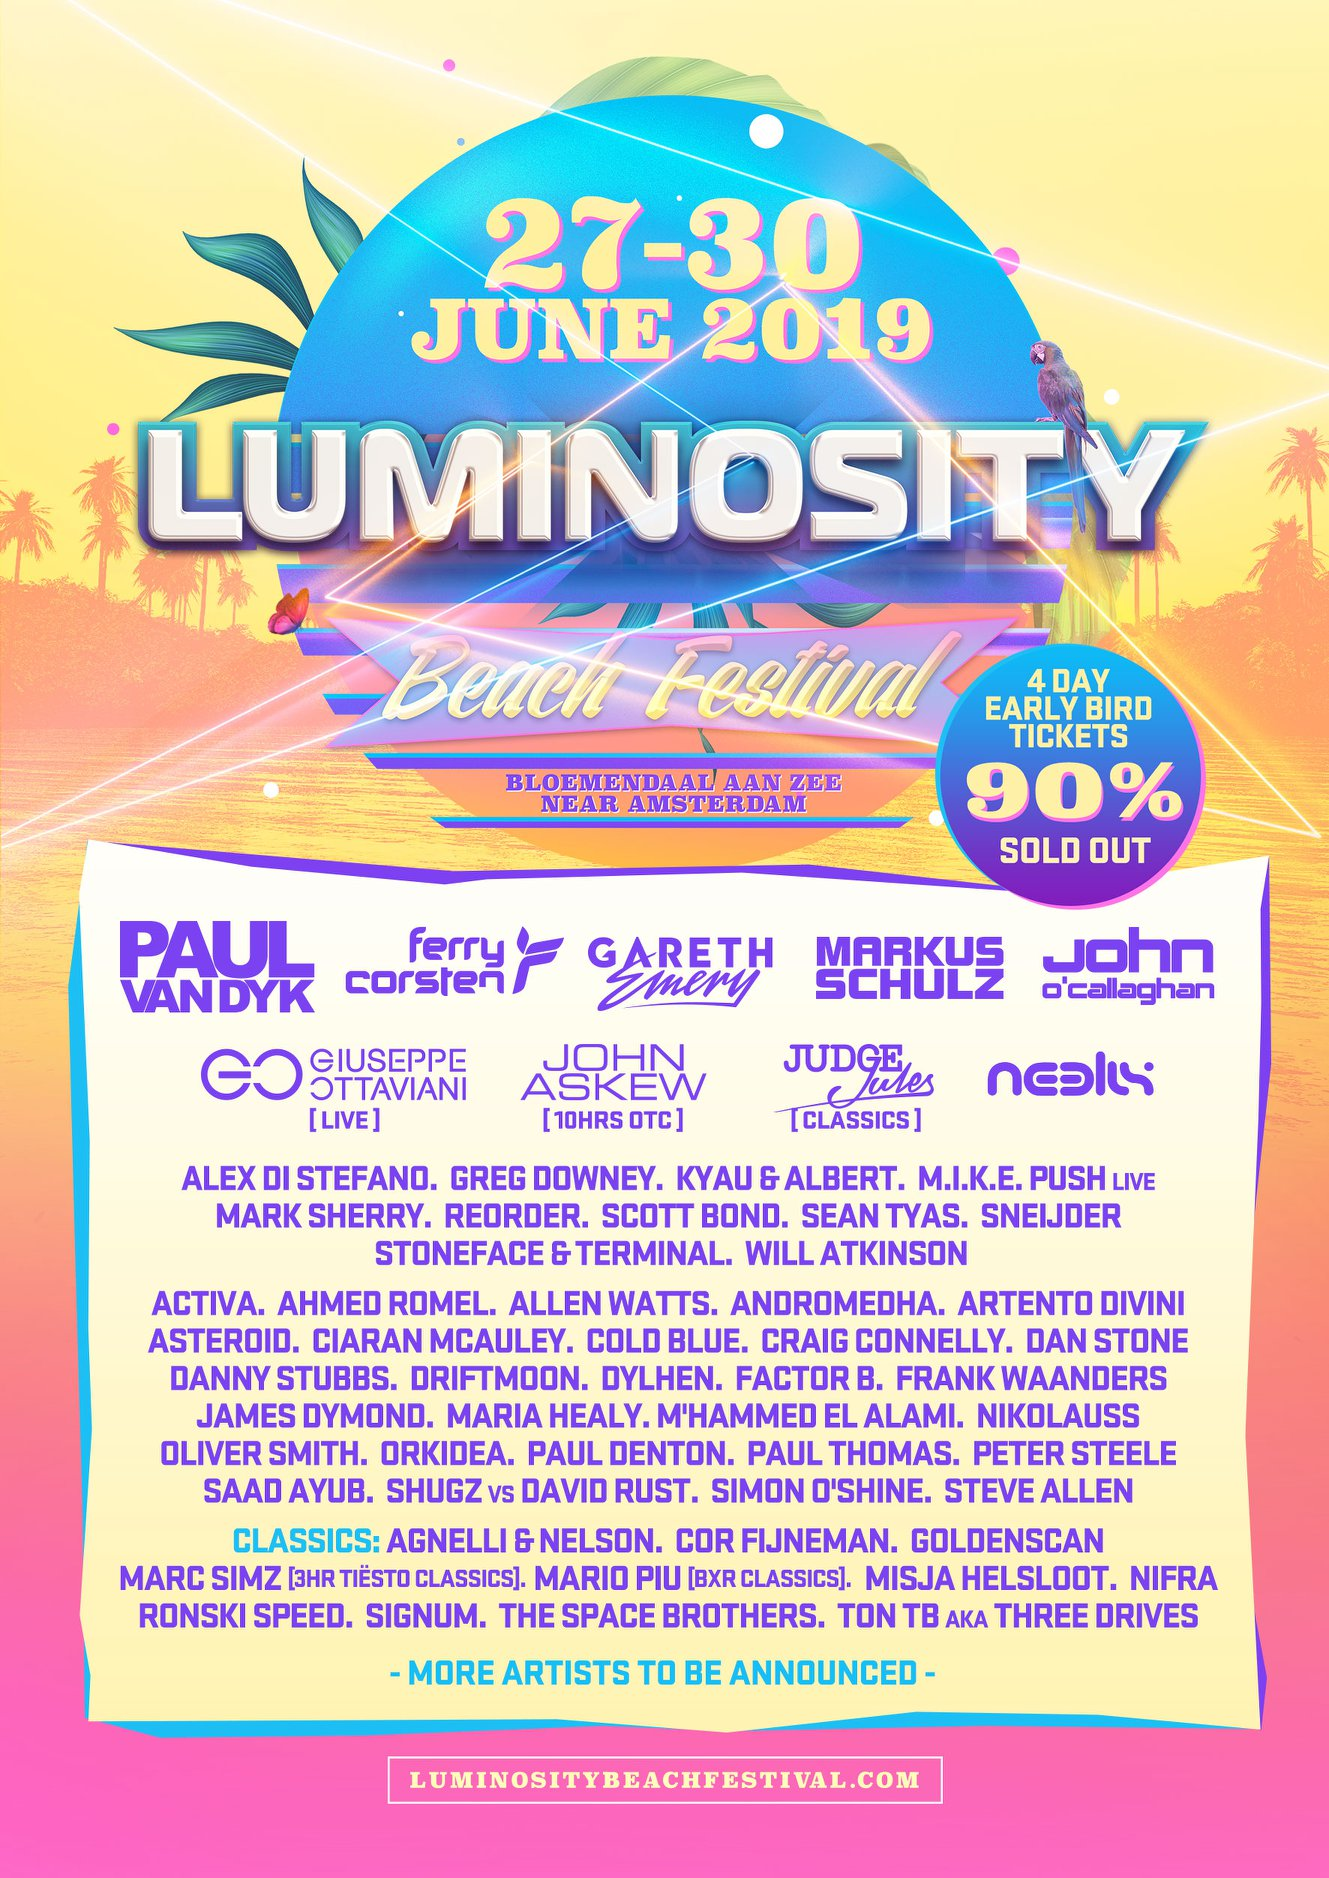 Luminosity Beach Festival 2019 Phase 2 Lineup